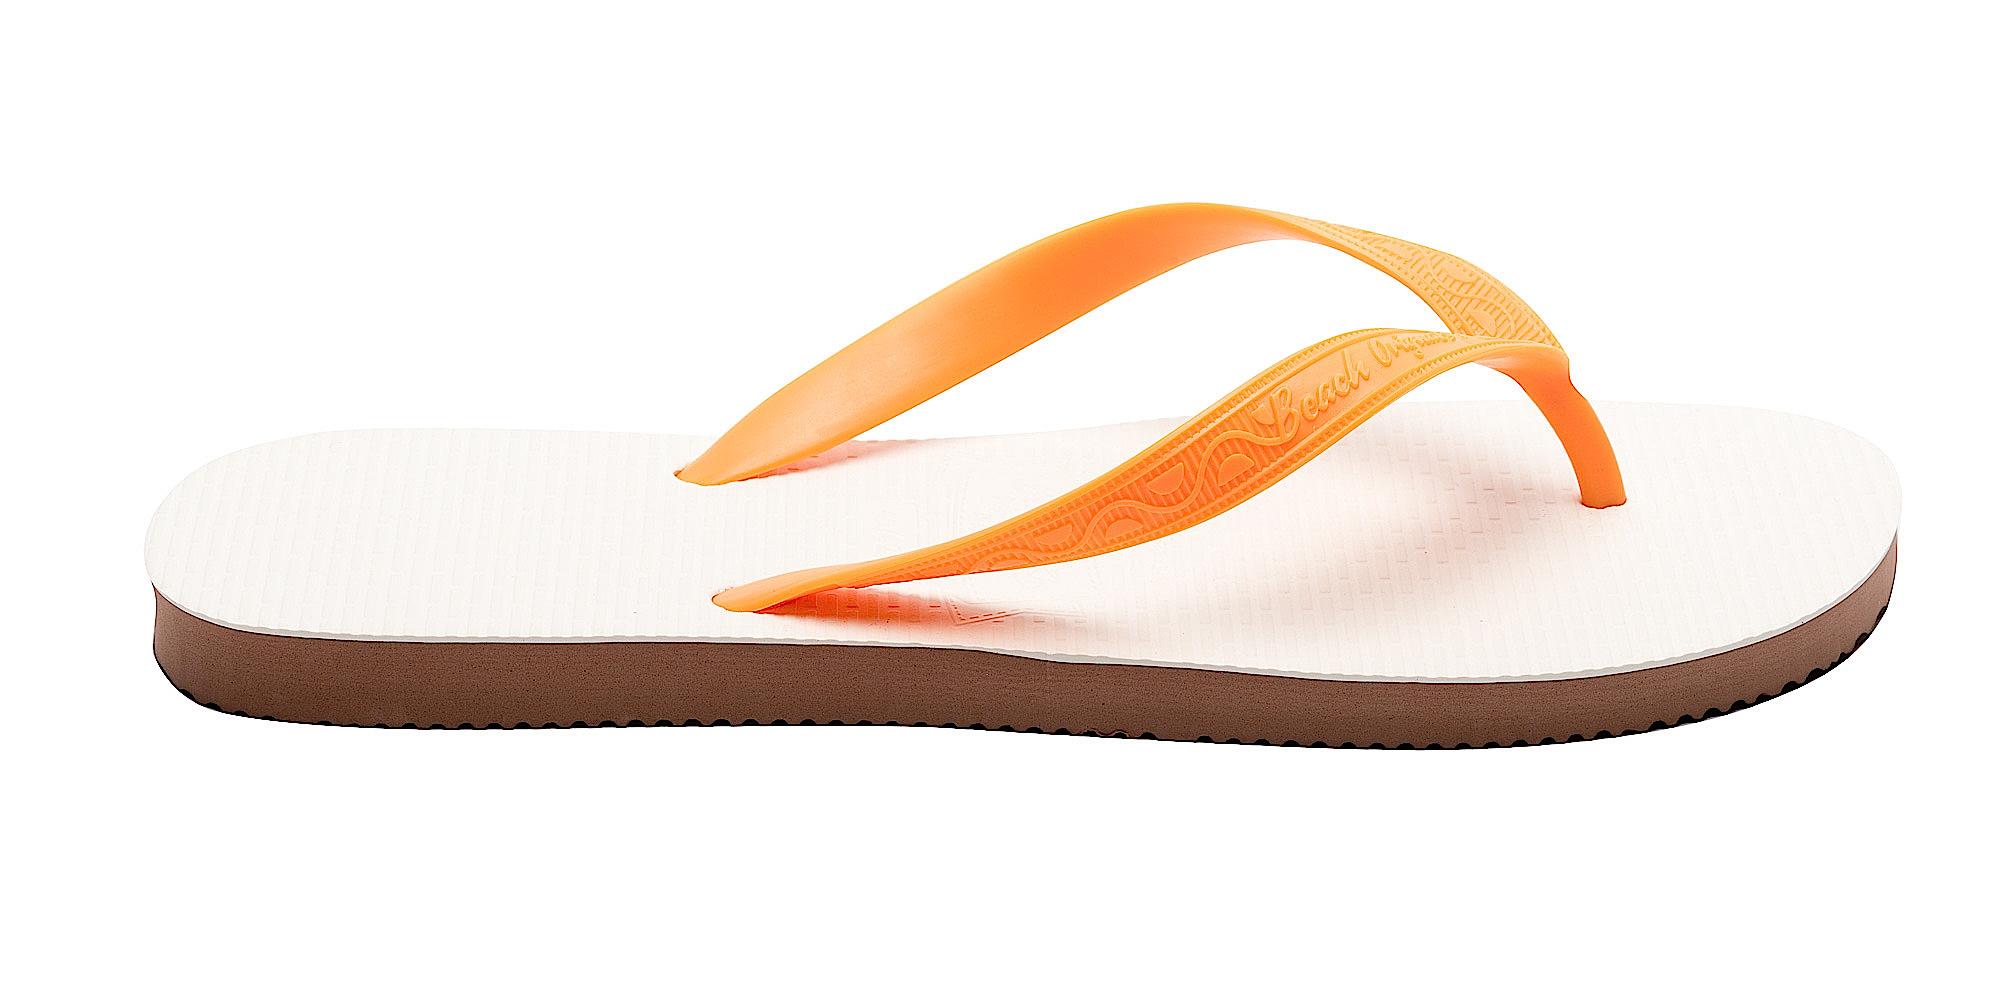 Tong modèle Santa Monica orange california. Vue de profil